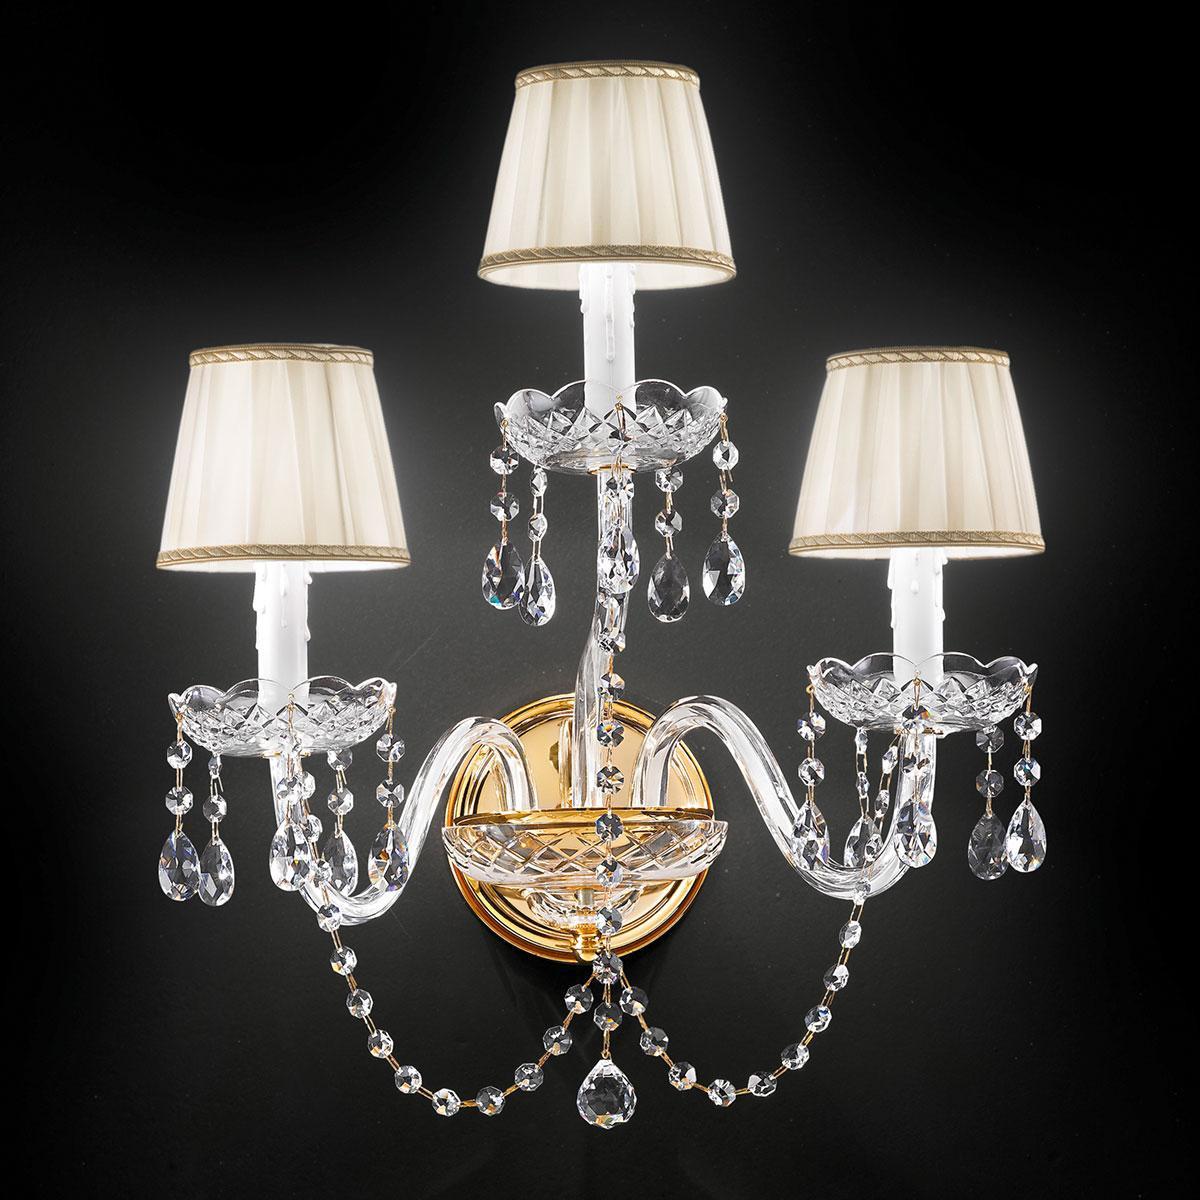 """Barbieri"" venetian crystal wall sconce - 2+1 lights - transparent with Asfour venetian crystal"